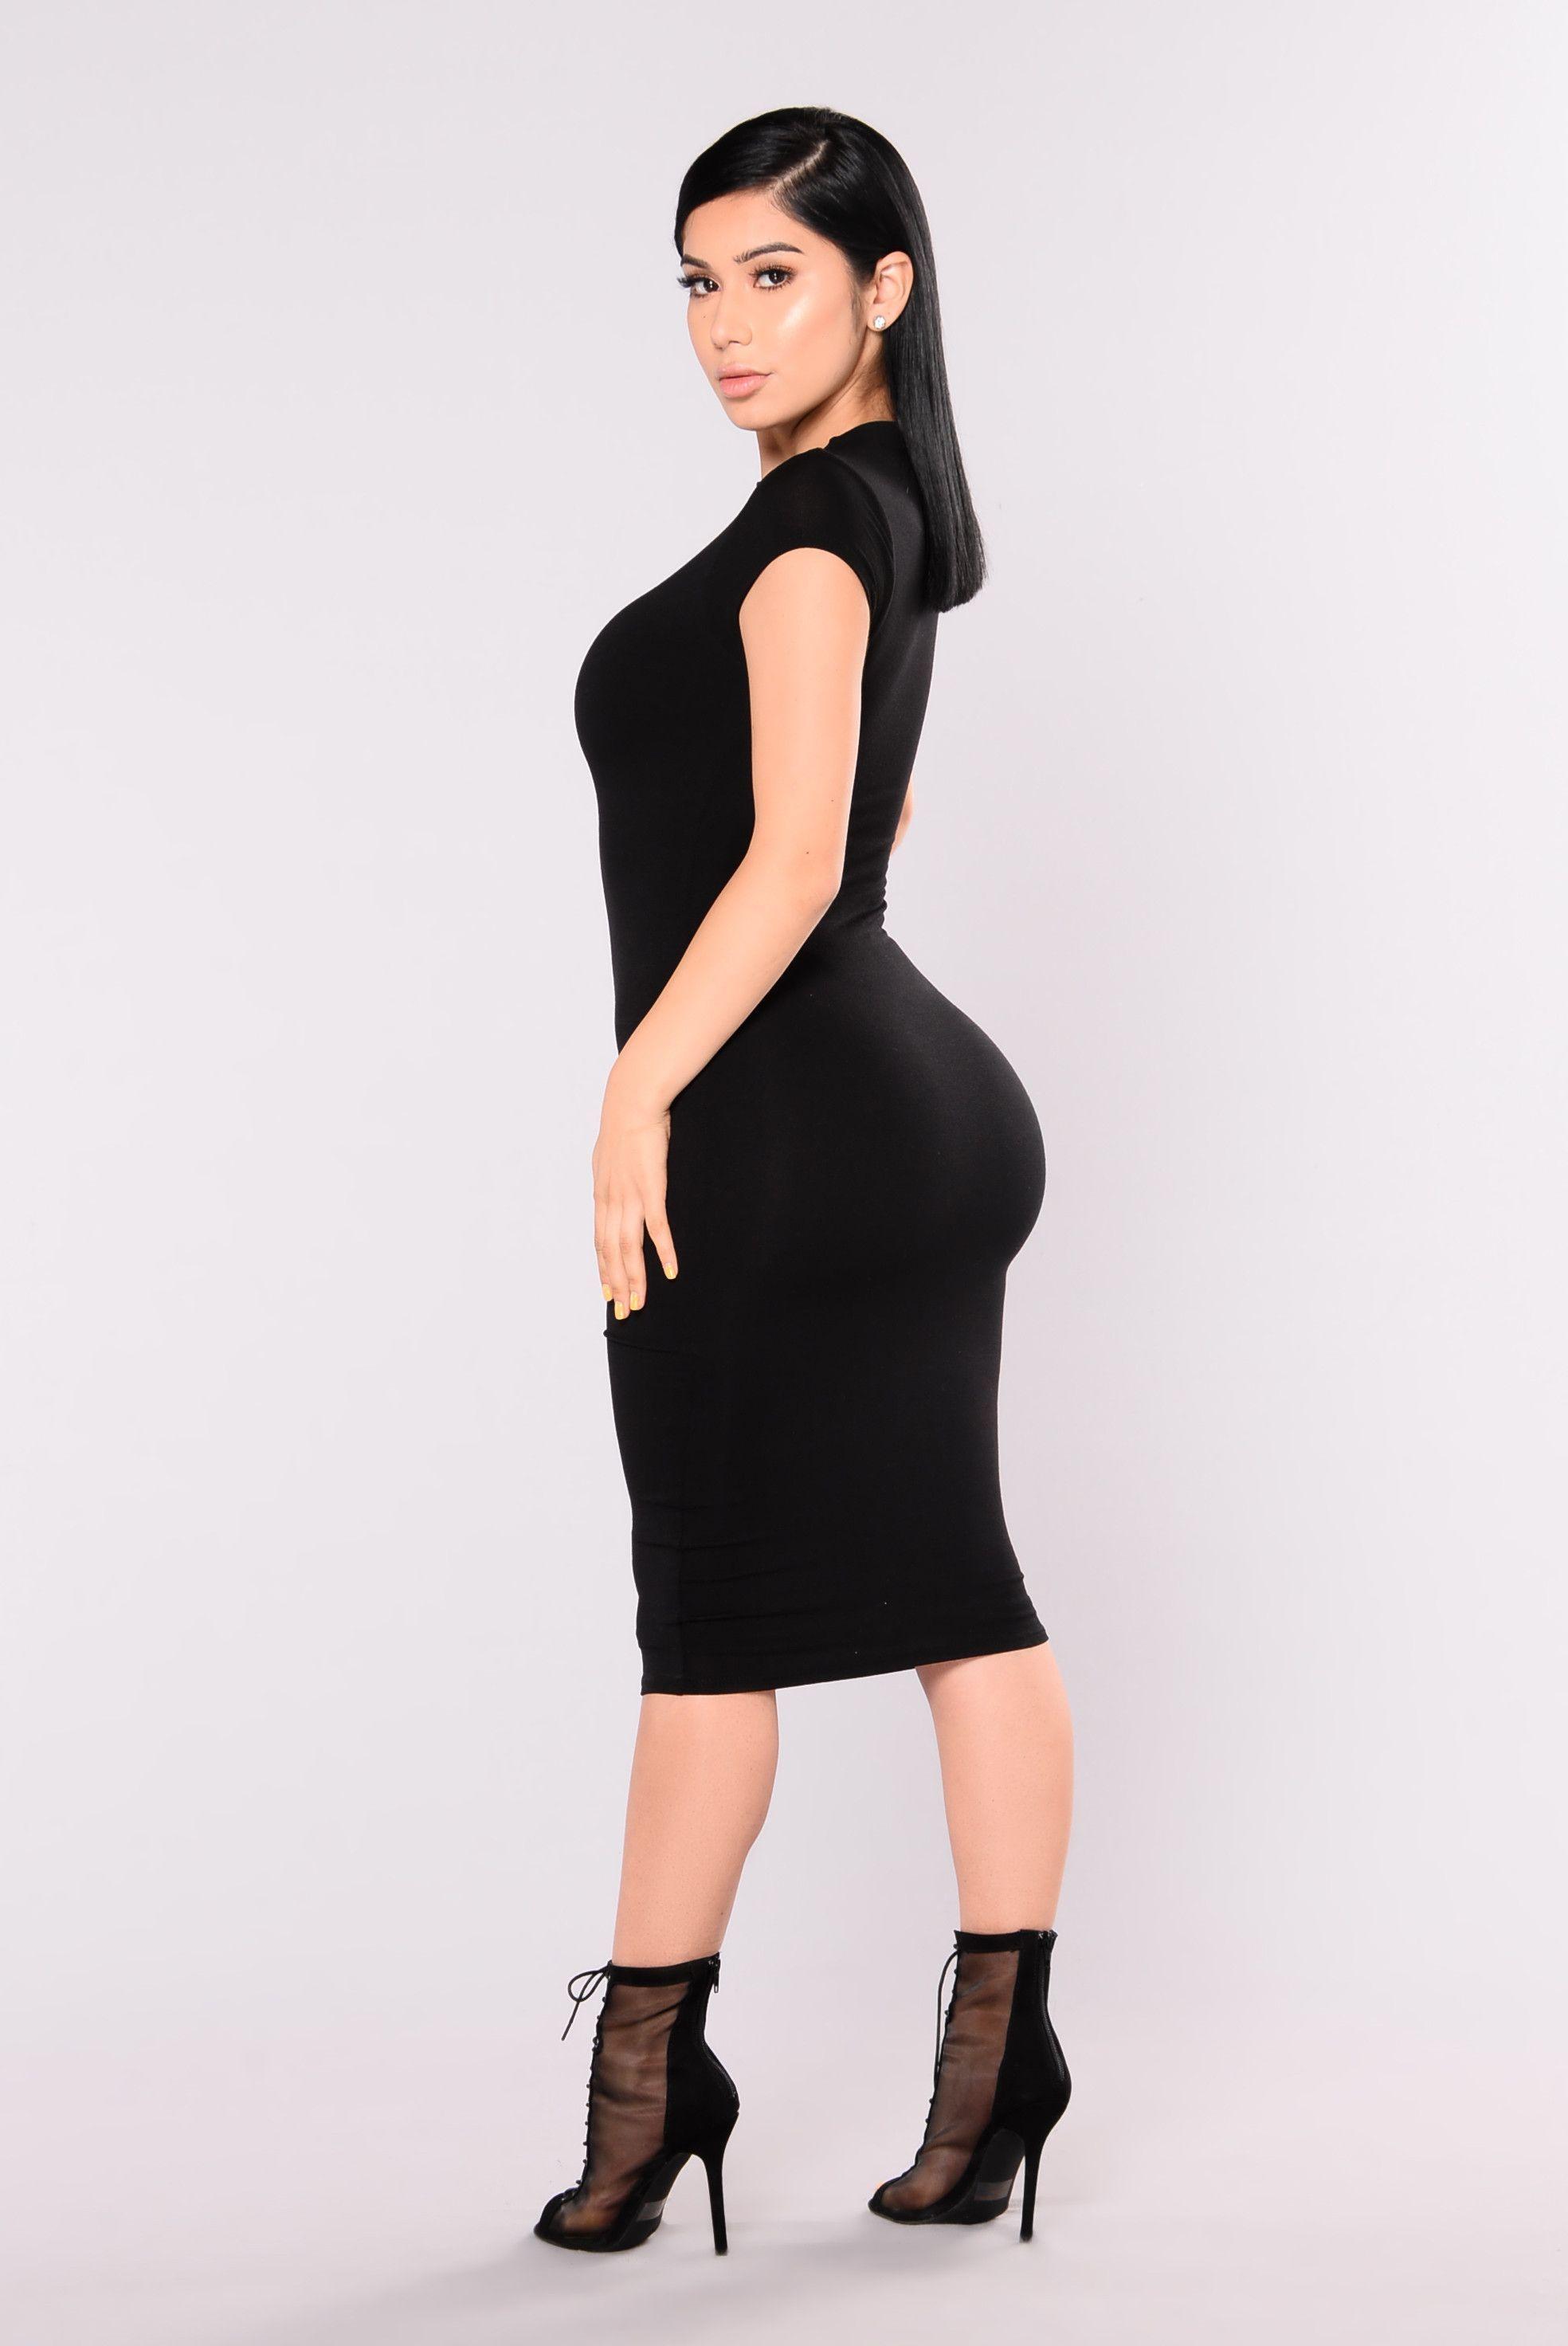 Jojo dress black rompers women black and midi dresses